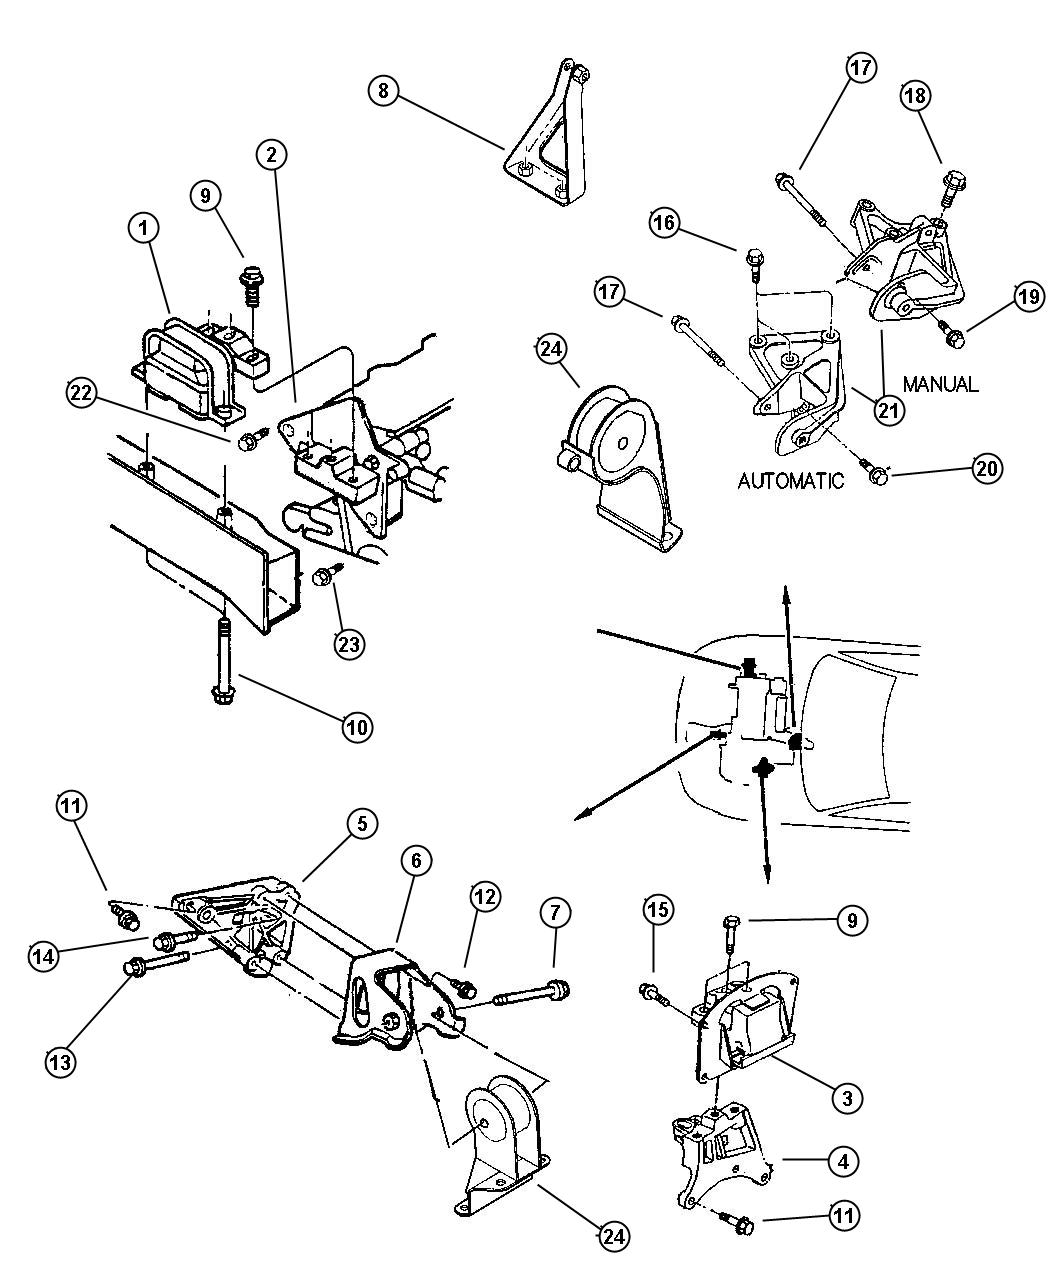 2004 dodge 2 7 engine diagram bmw e46 airbag wiring stratus 4l dohc get free image